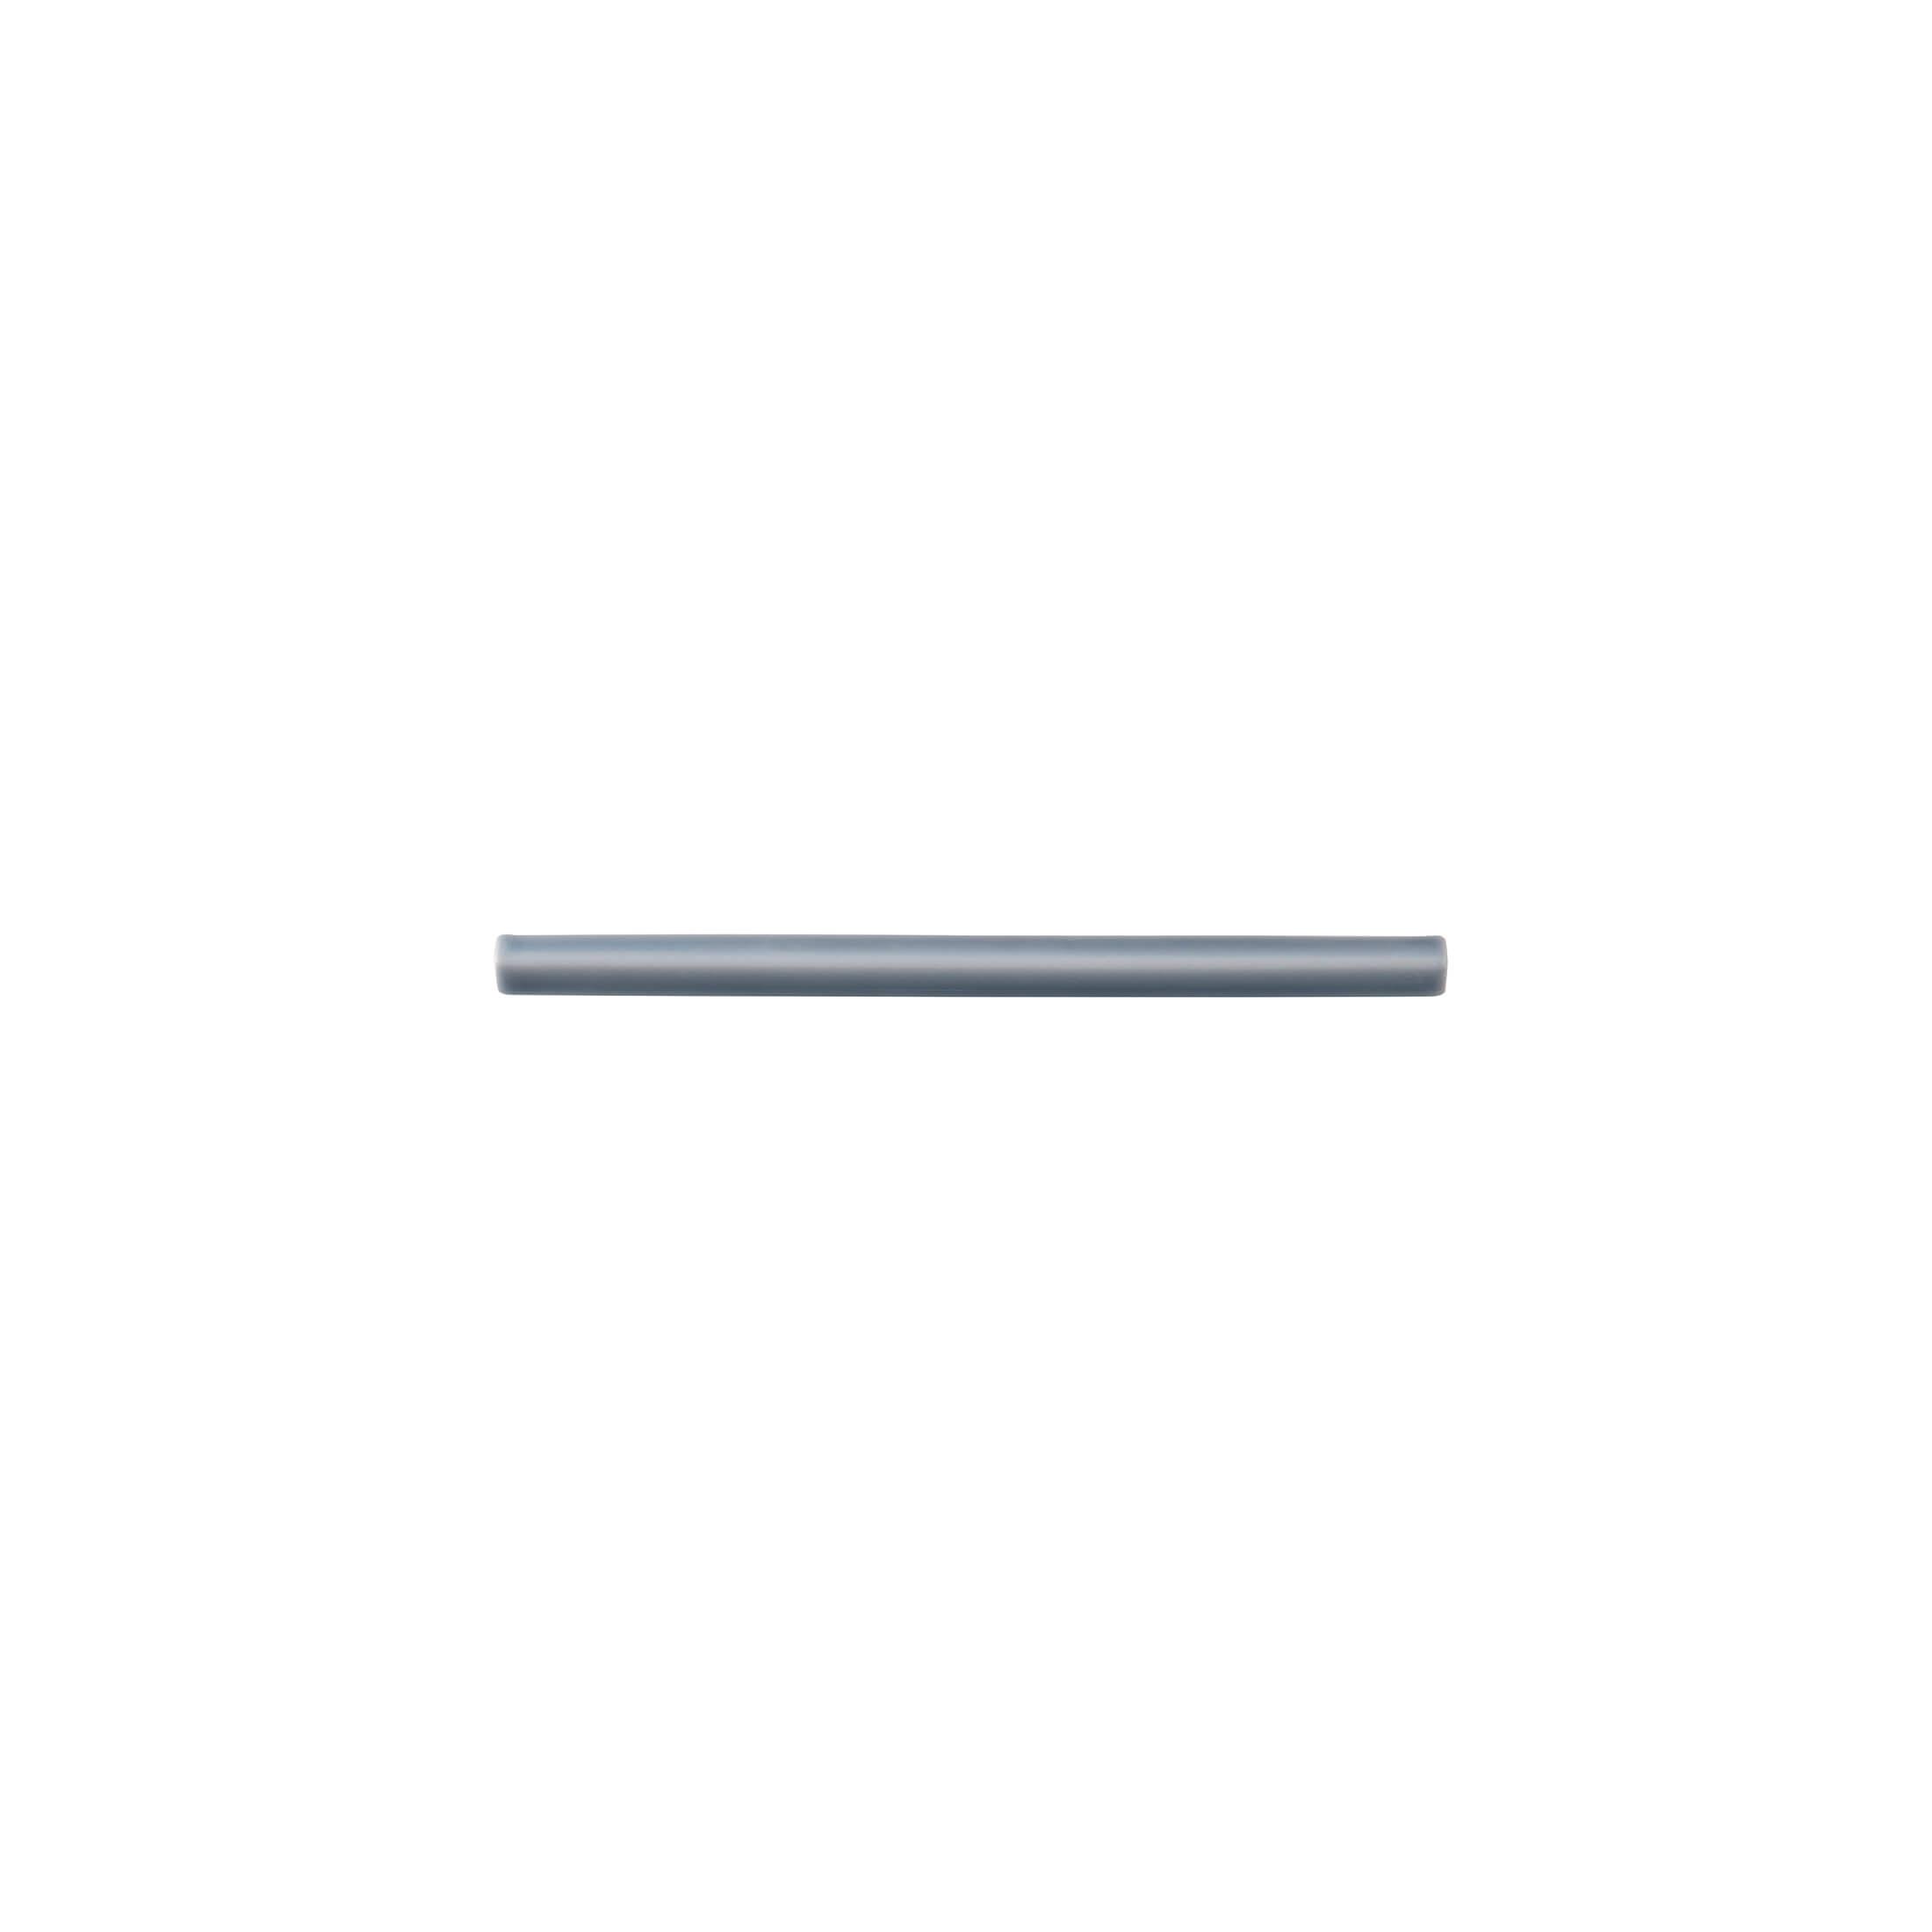 ADNE5610 - BULLNOSE TRIM - 0.85 cm X 15 cm